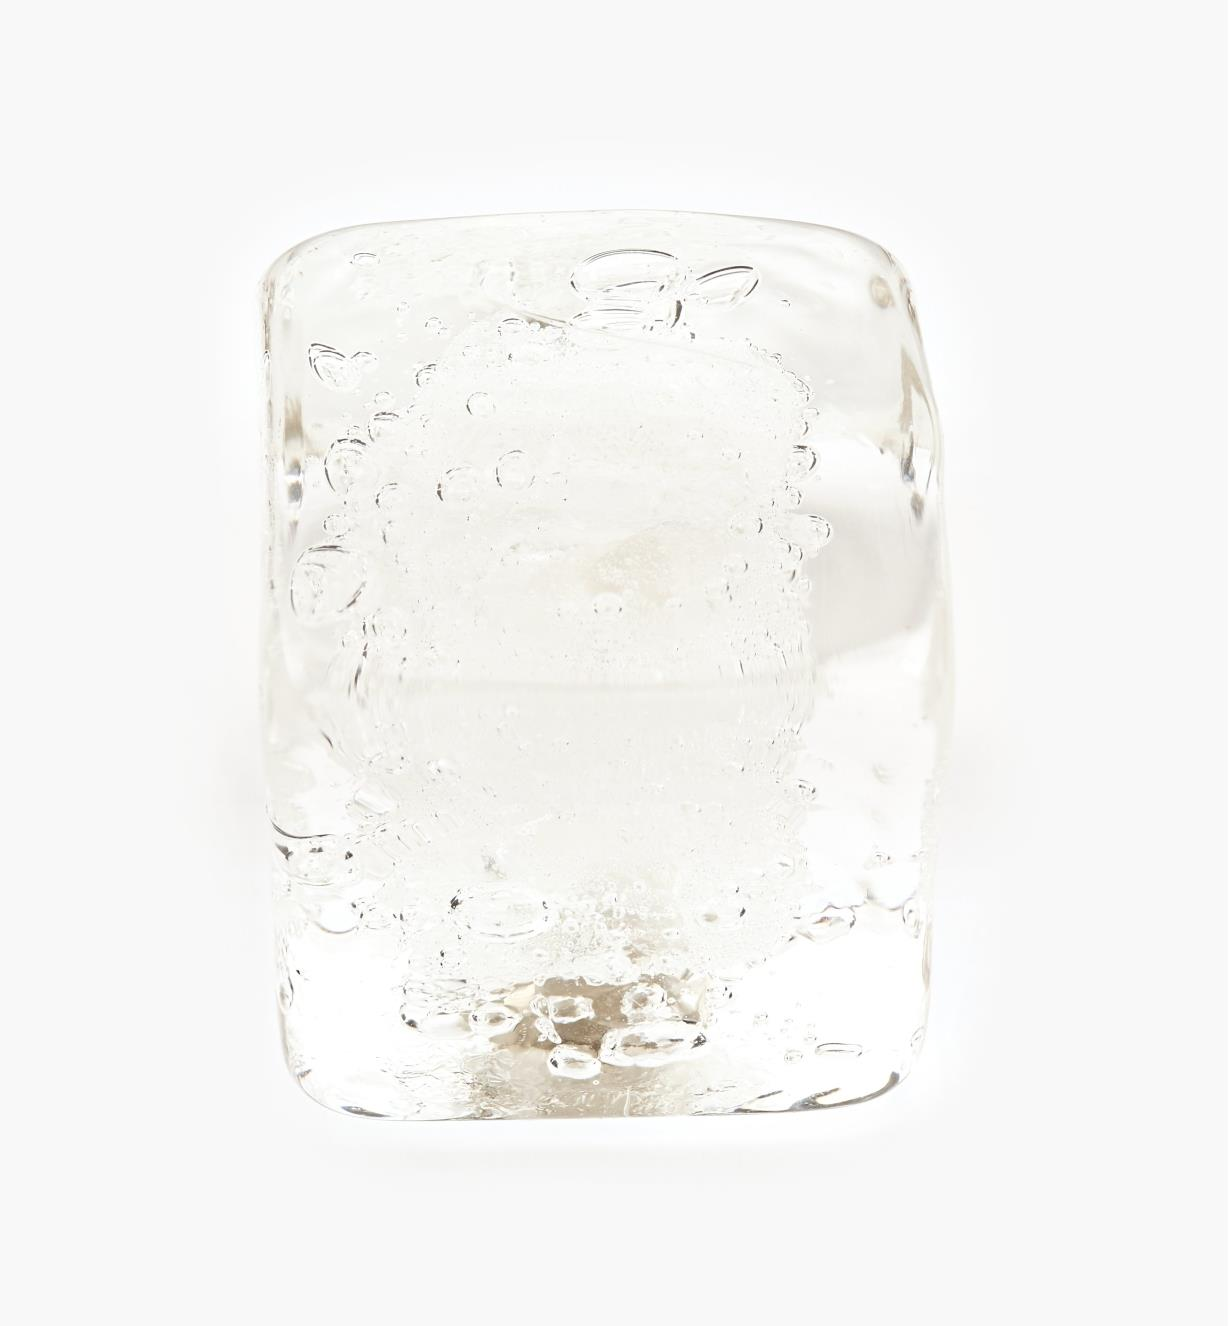 00A7704 - Bouton en verre de Murano Venezia, cristal, 1 po